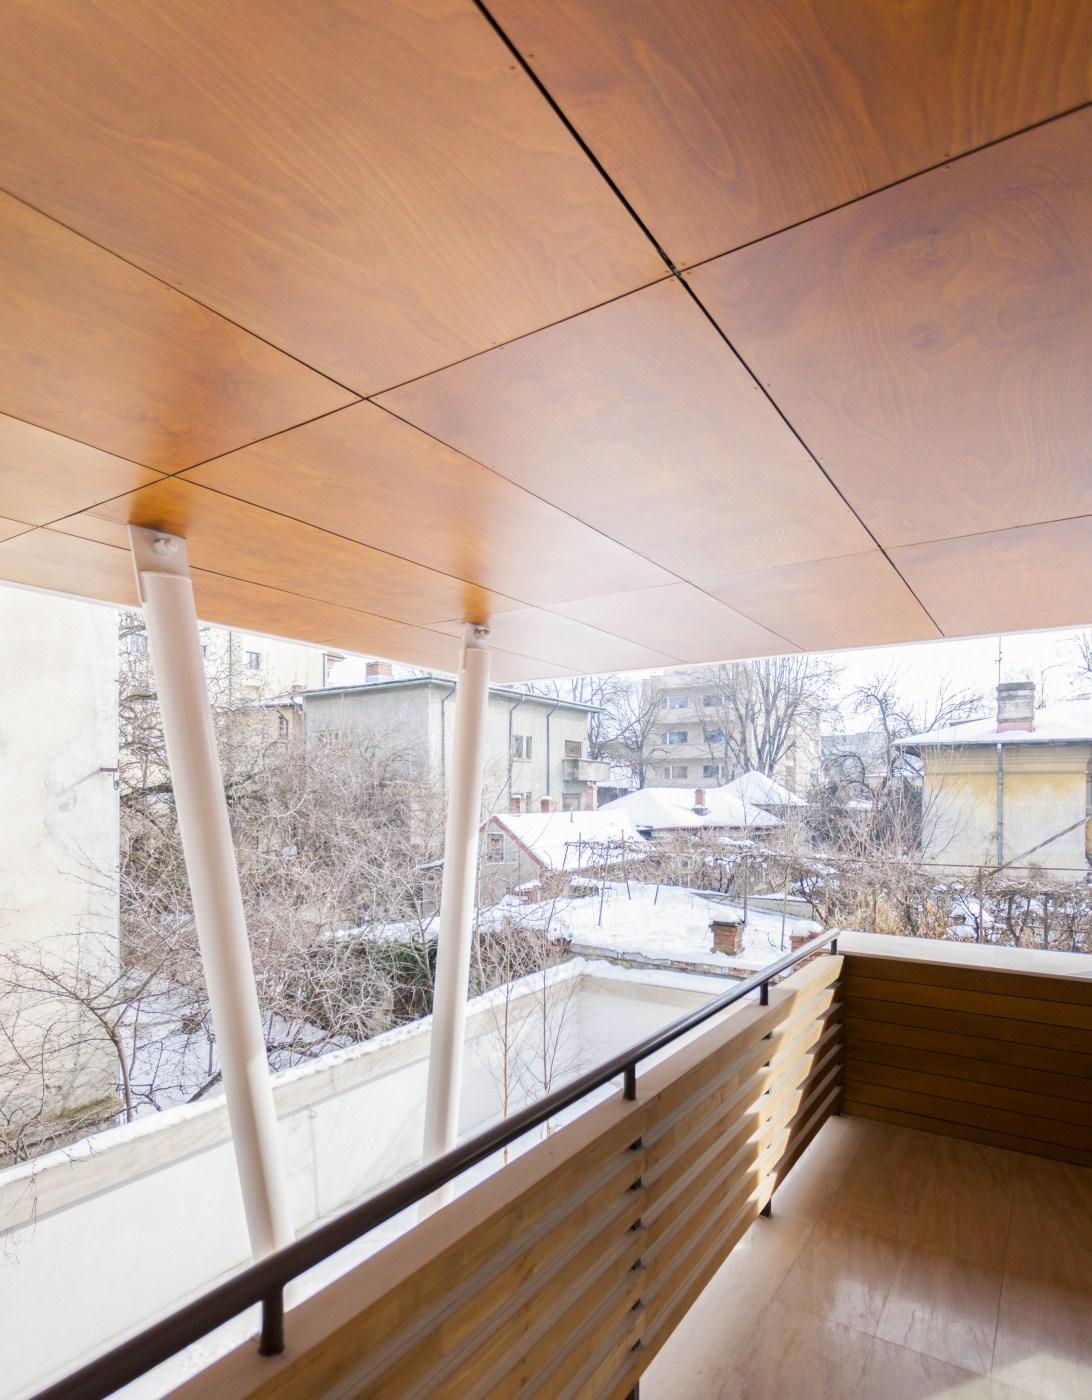 https://nbc-arhitect.ro/wp-content/uploads/2020/10/NBC-ARHITECT-_-housing-_-Sandu-Aldea-House-Villa-_-exterior-view-_-terrace_3.jpg